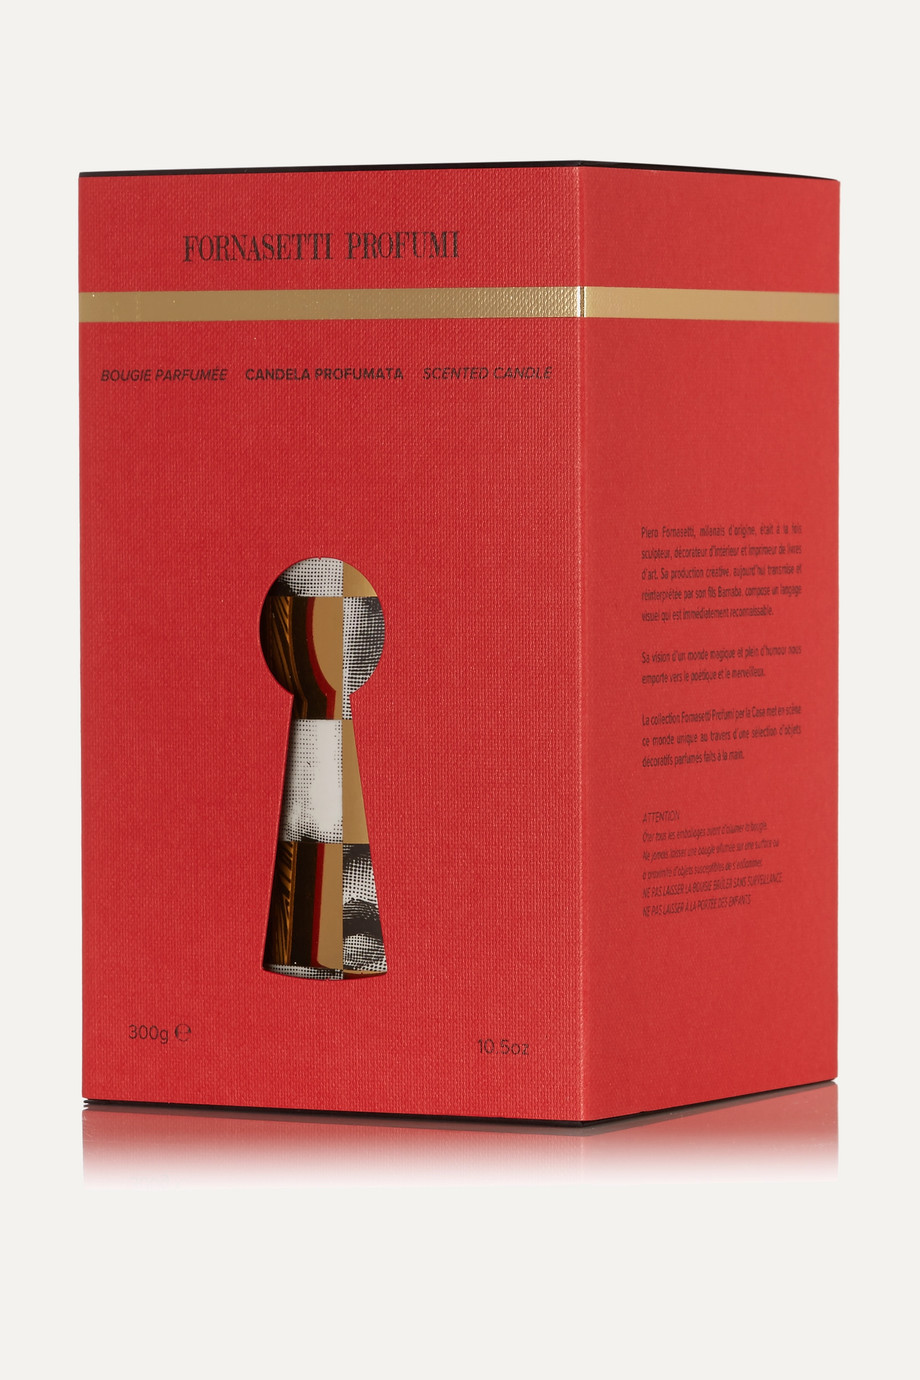 Fornasetti Scacco Otto scented candle, 300g